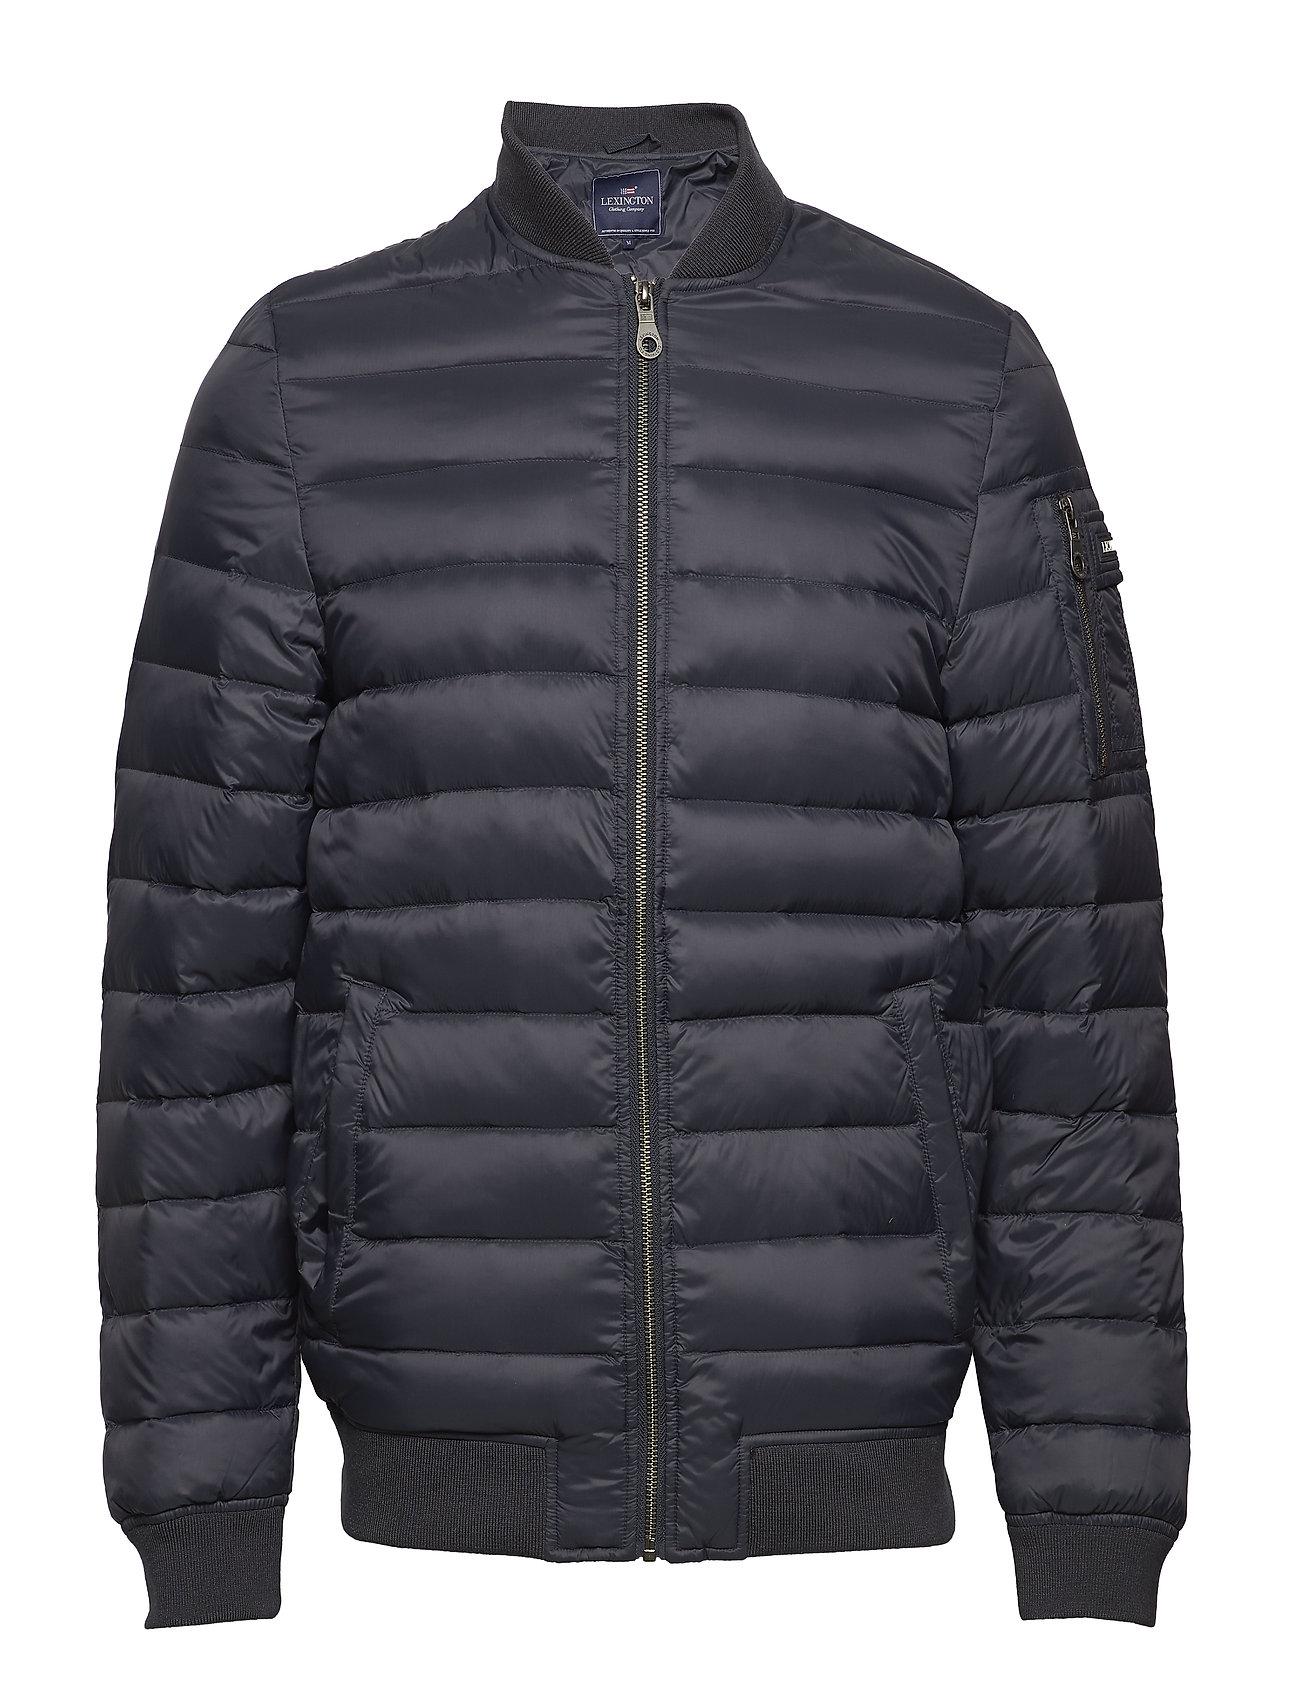 Lexington Clothing Aiden Bomber Down Jacket